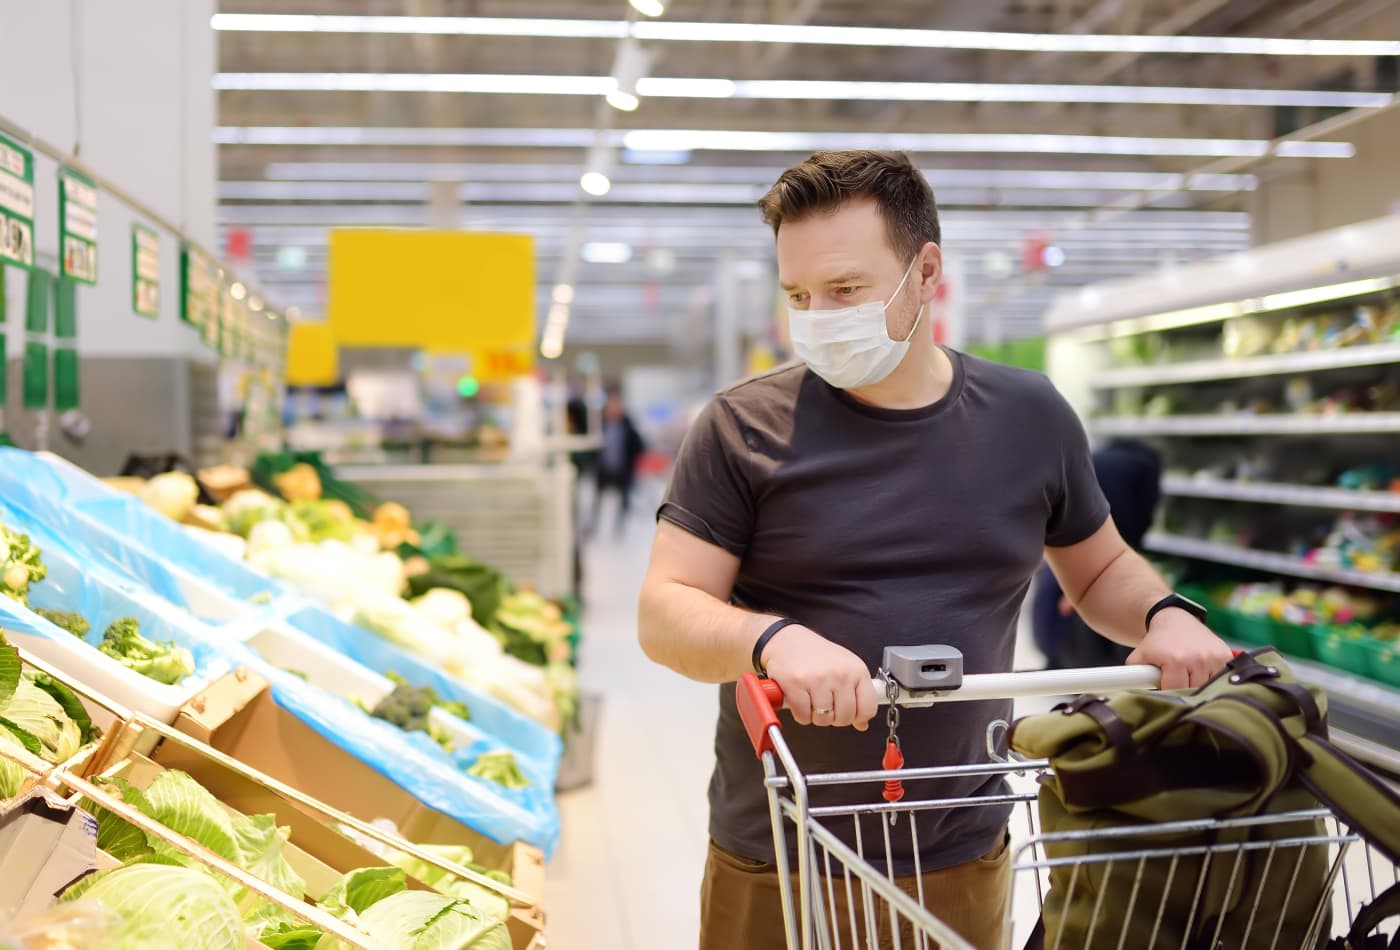 Costco Target How Stores Adapt To Prevent Coronavirus Spread